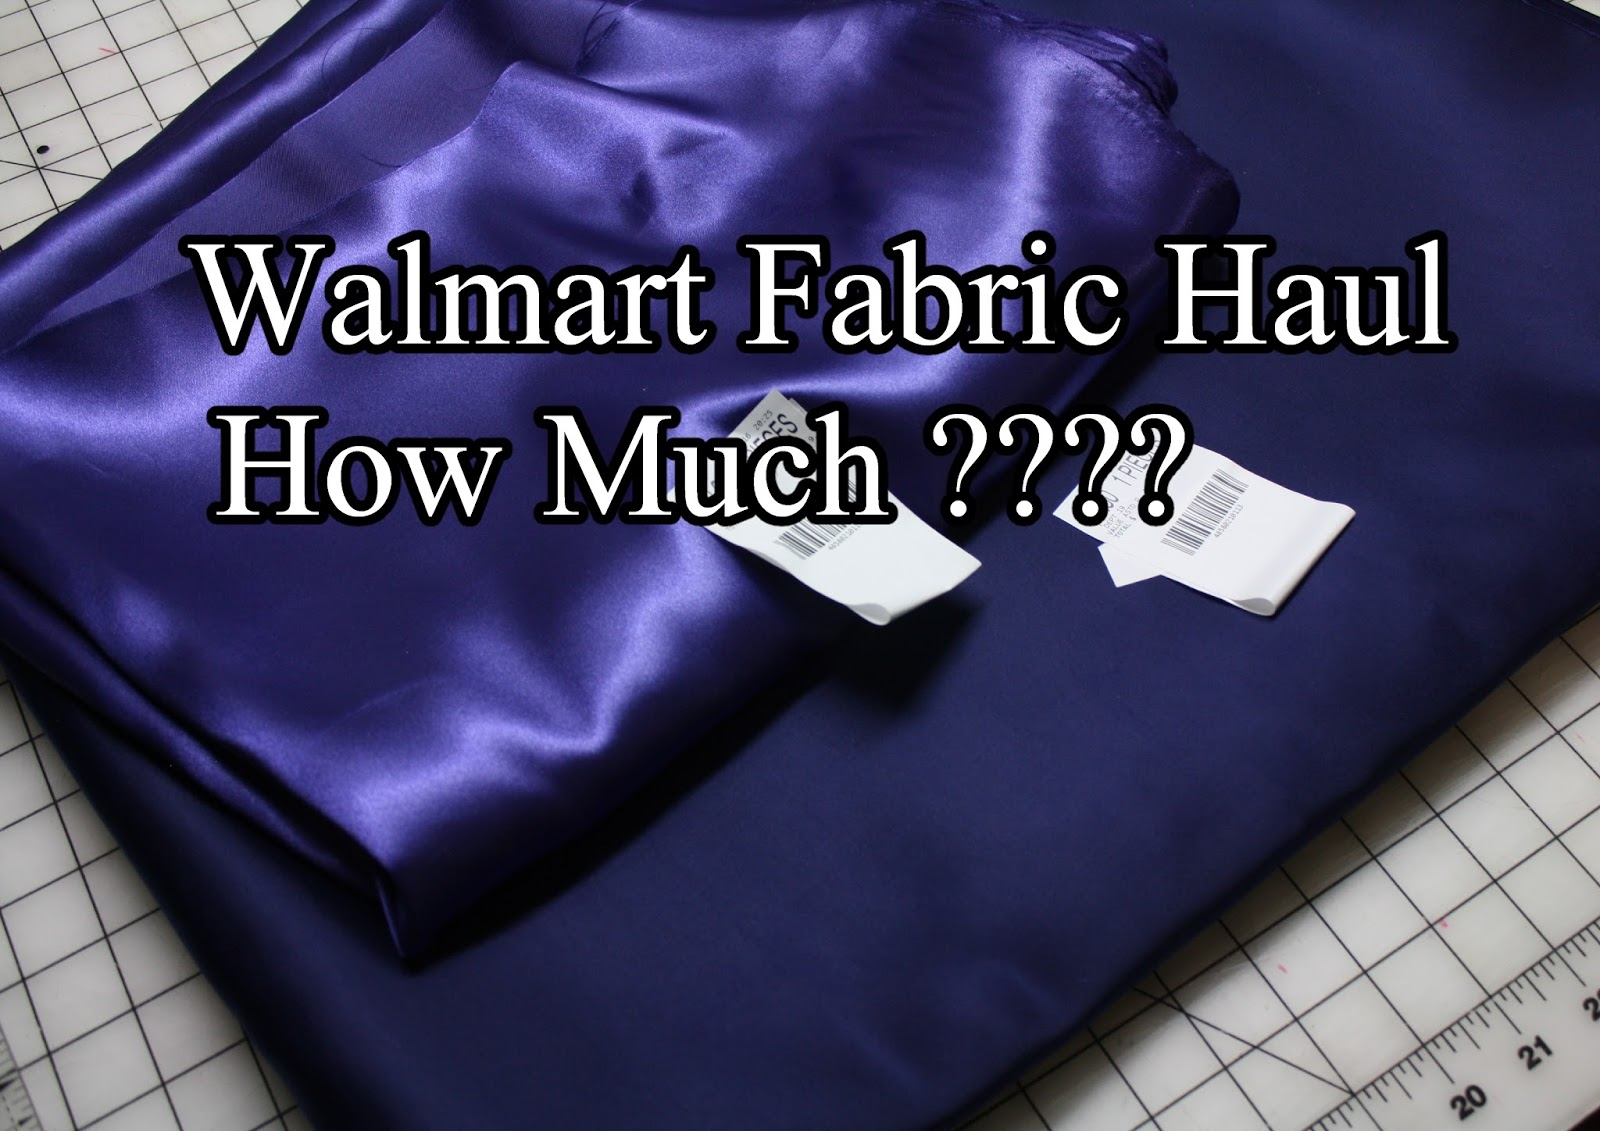 Walmart Fabric Haul - How Much ??   Christopher Nejman